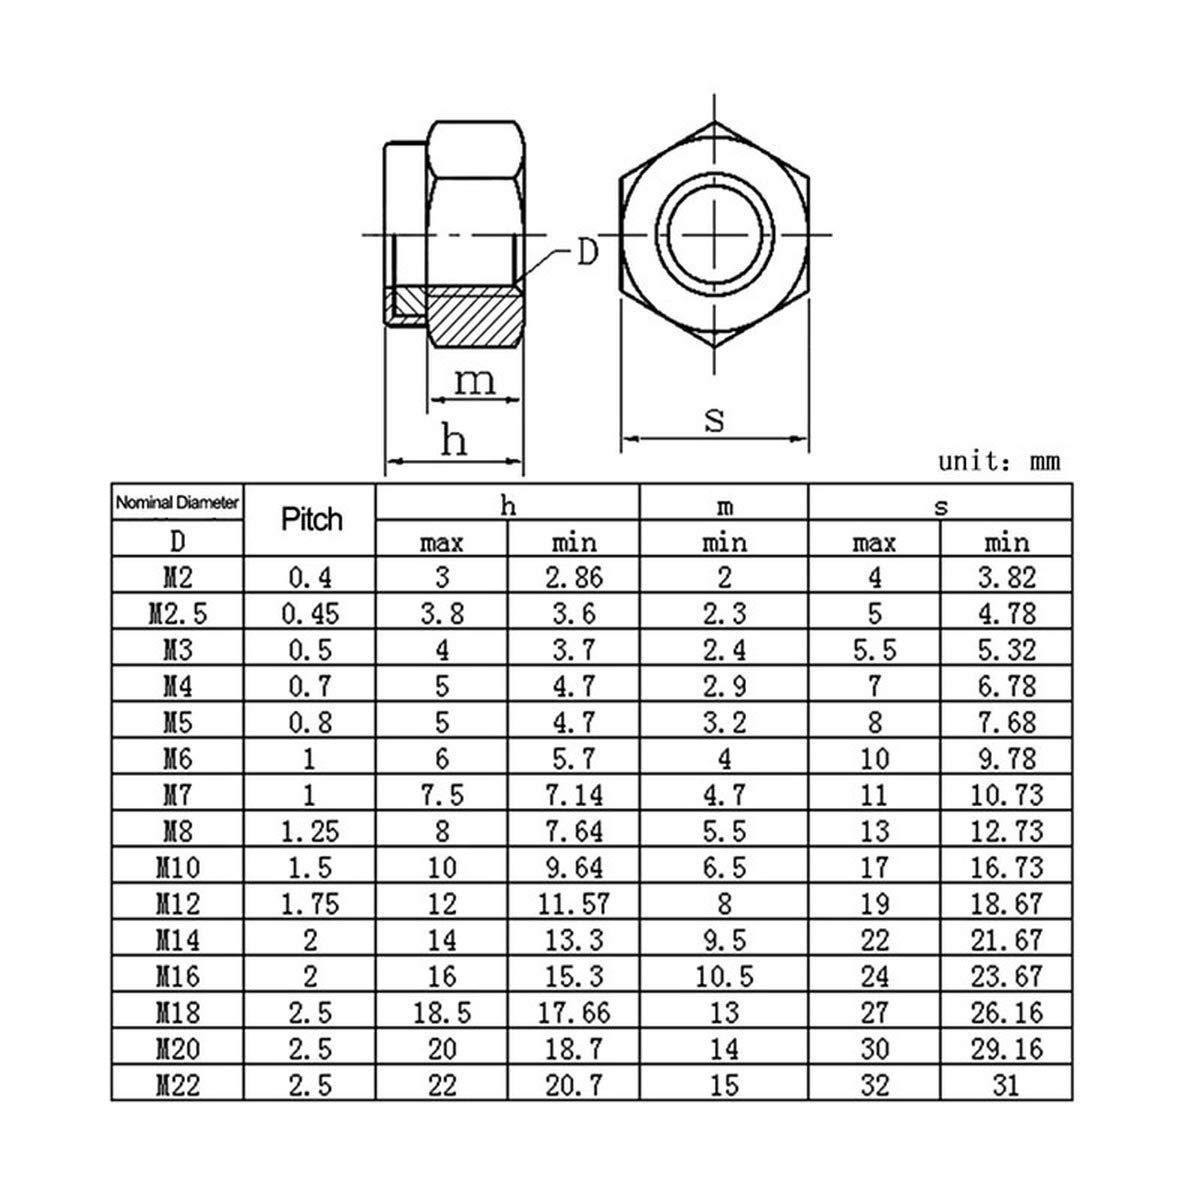 M5 300Pcs Luchang Nylon Lock Nut 304 Stainless Steel Hex Hexagon Locknut M3 M4 M5 M6 M8 M10 M12 M14 Nylon Nut